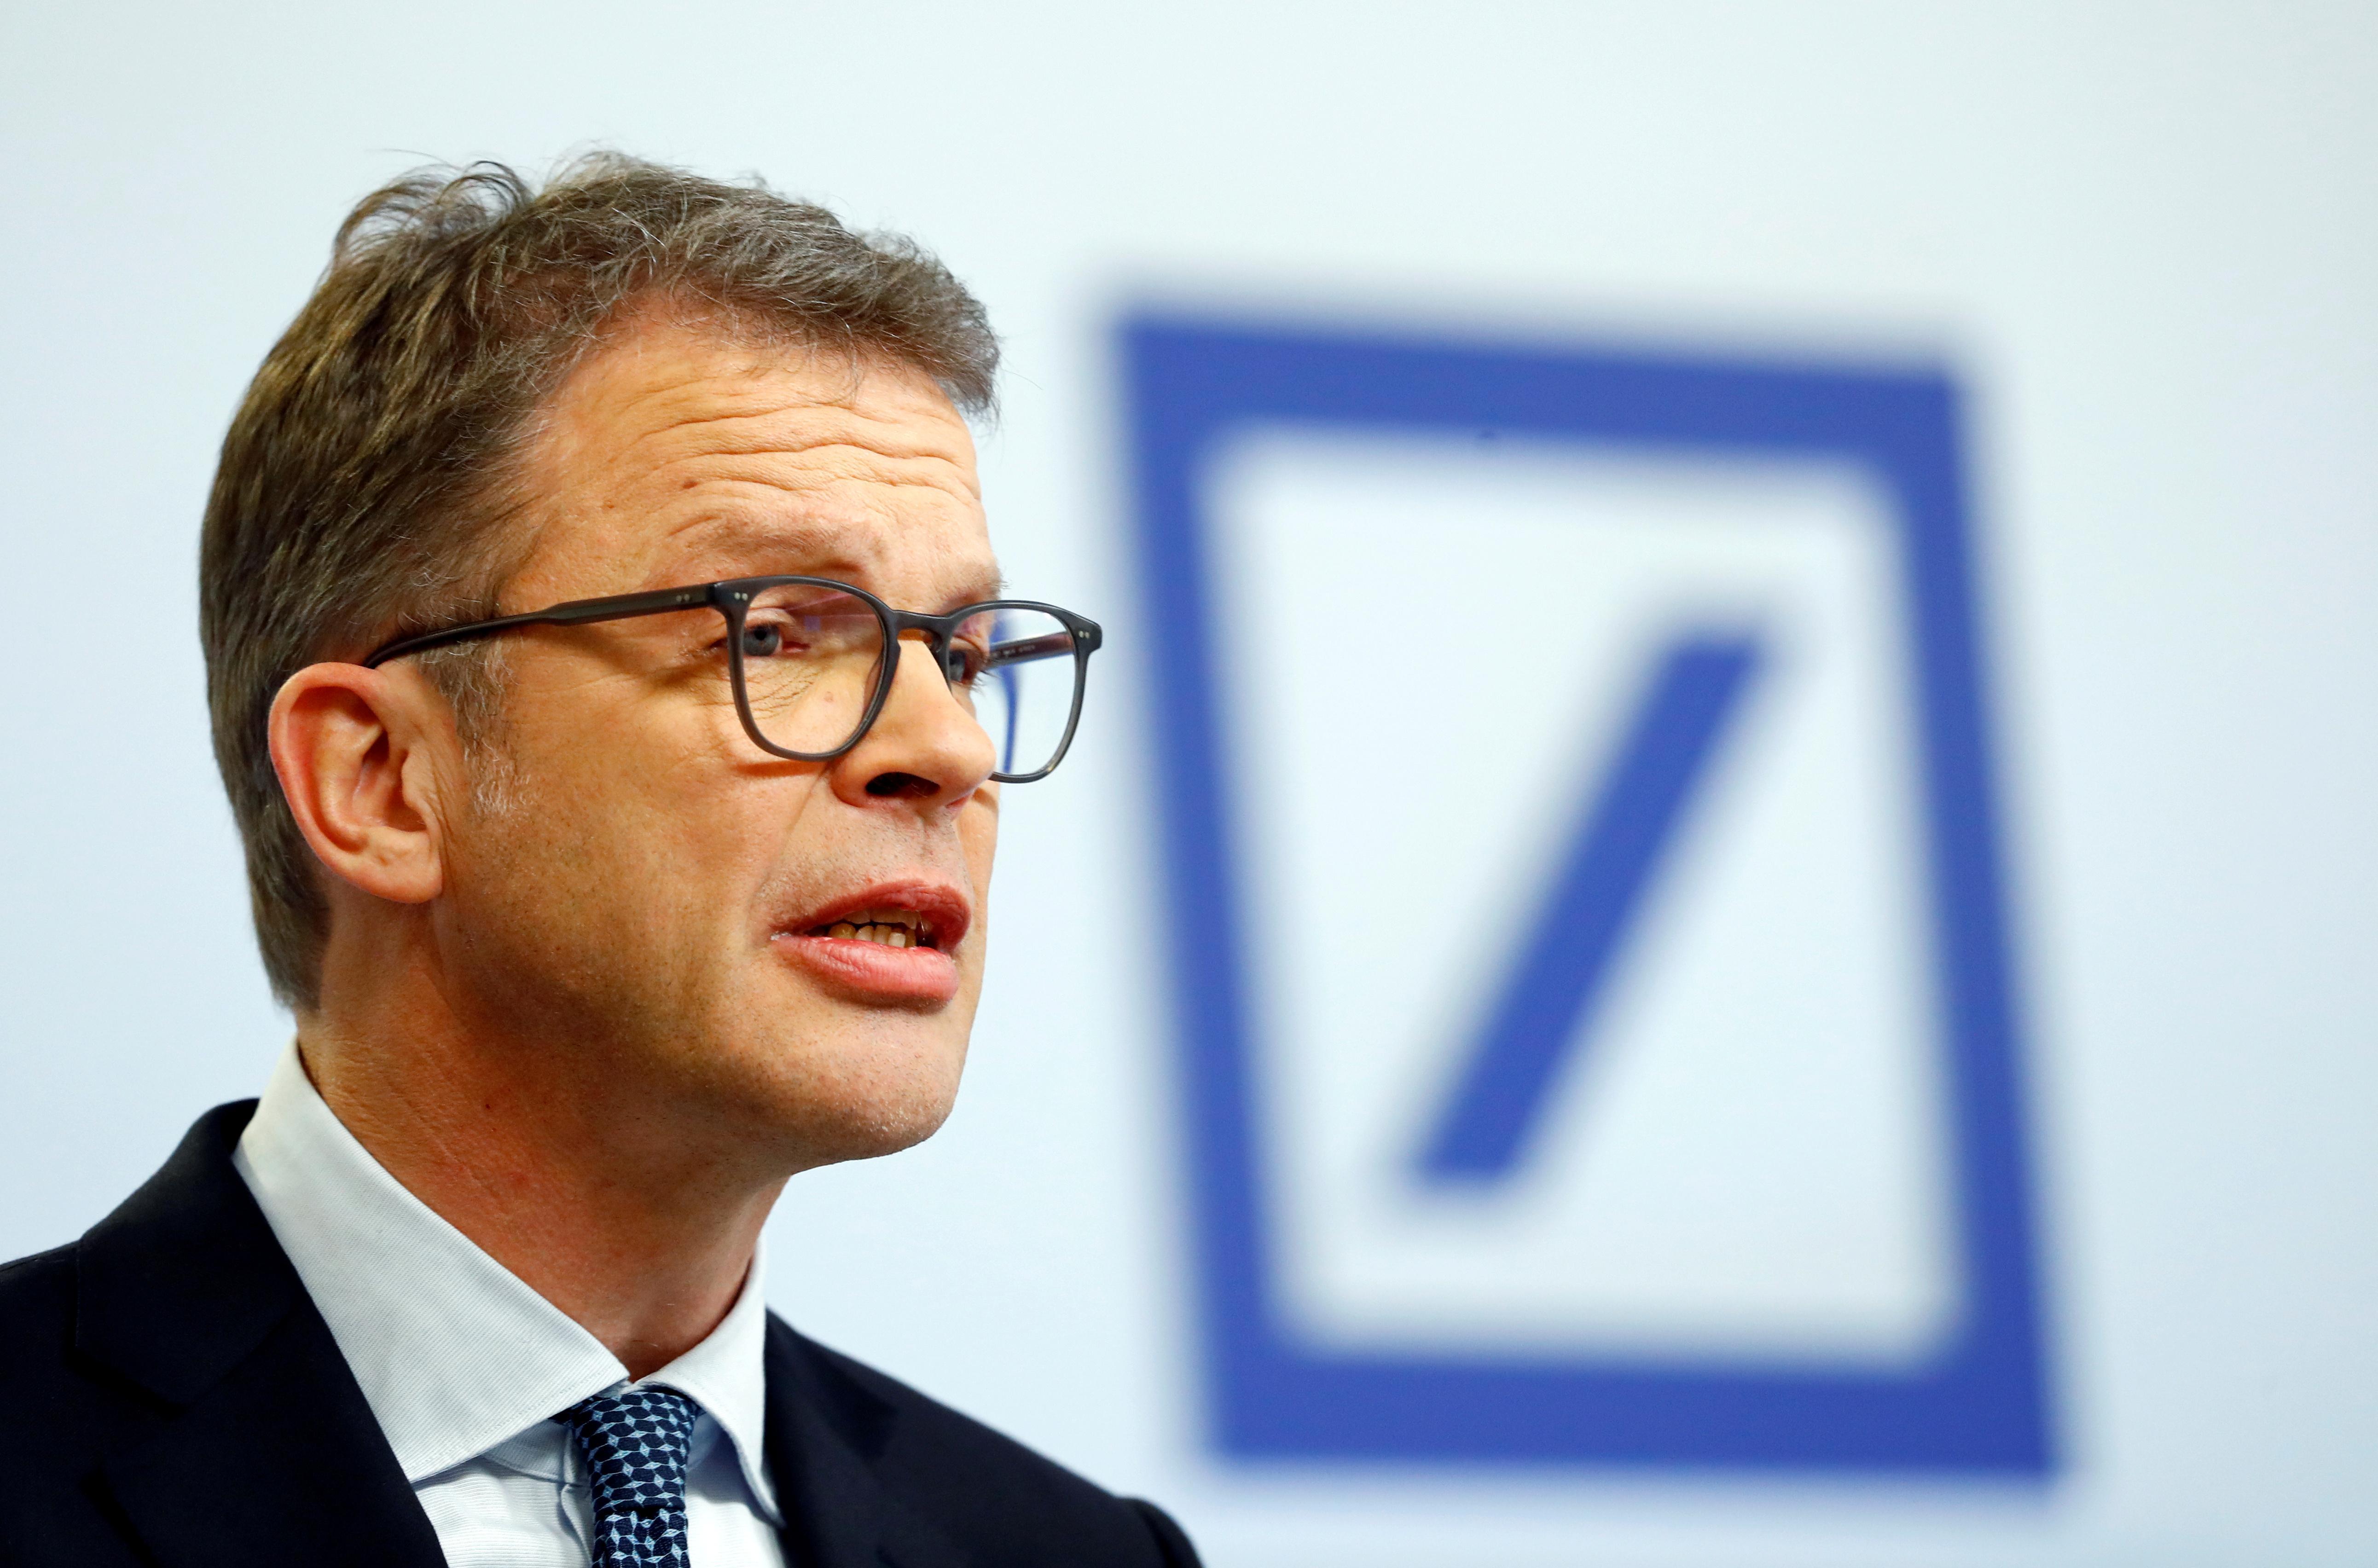 Deutsche Bank targets 200 billion euros of sustainable investment by 2025